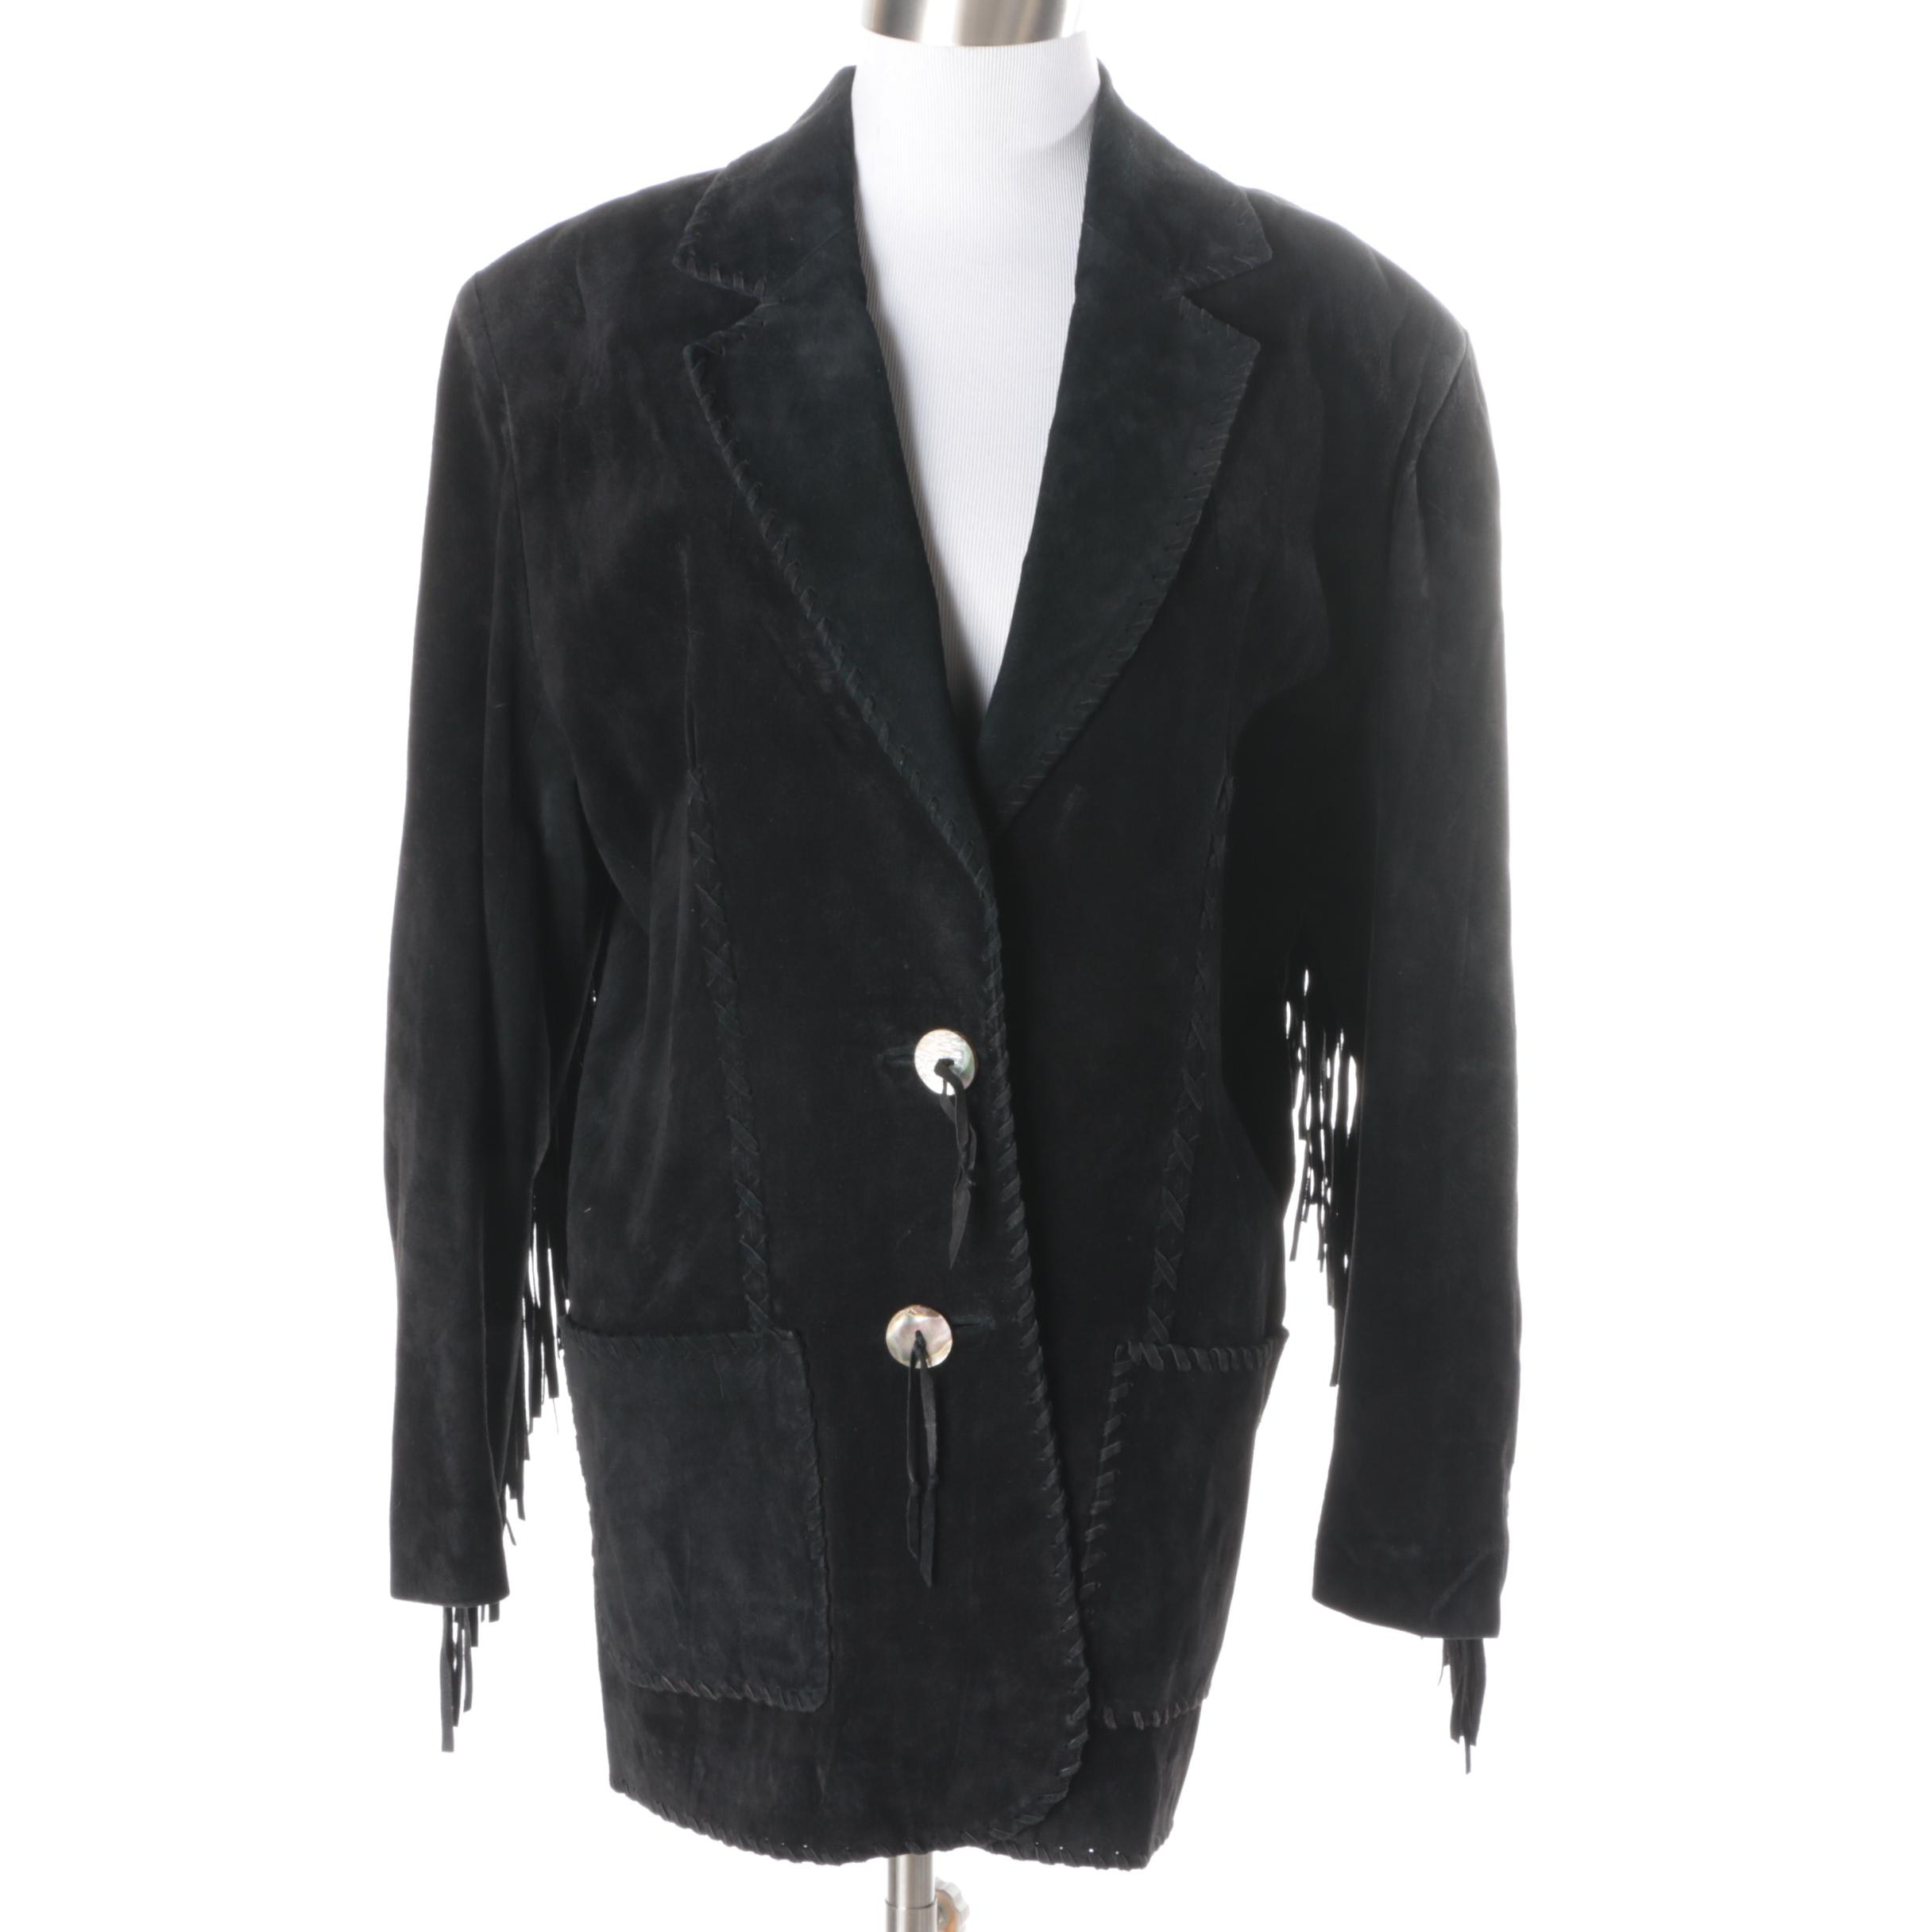 Women's Vintage Team Work Black Suede Jacket